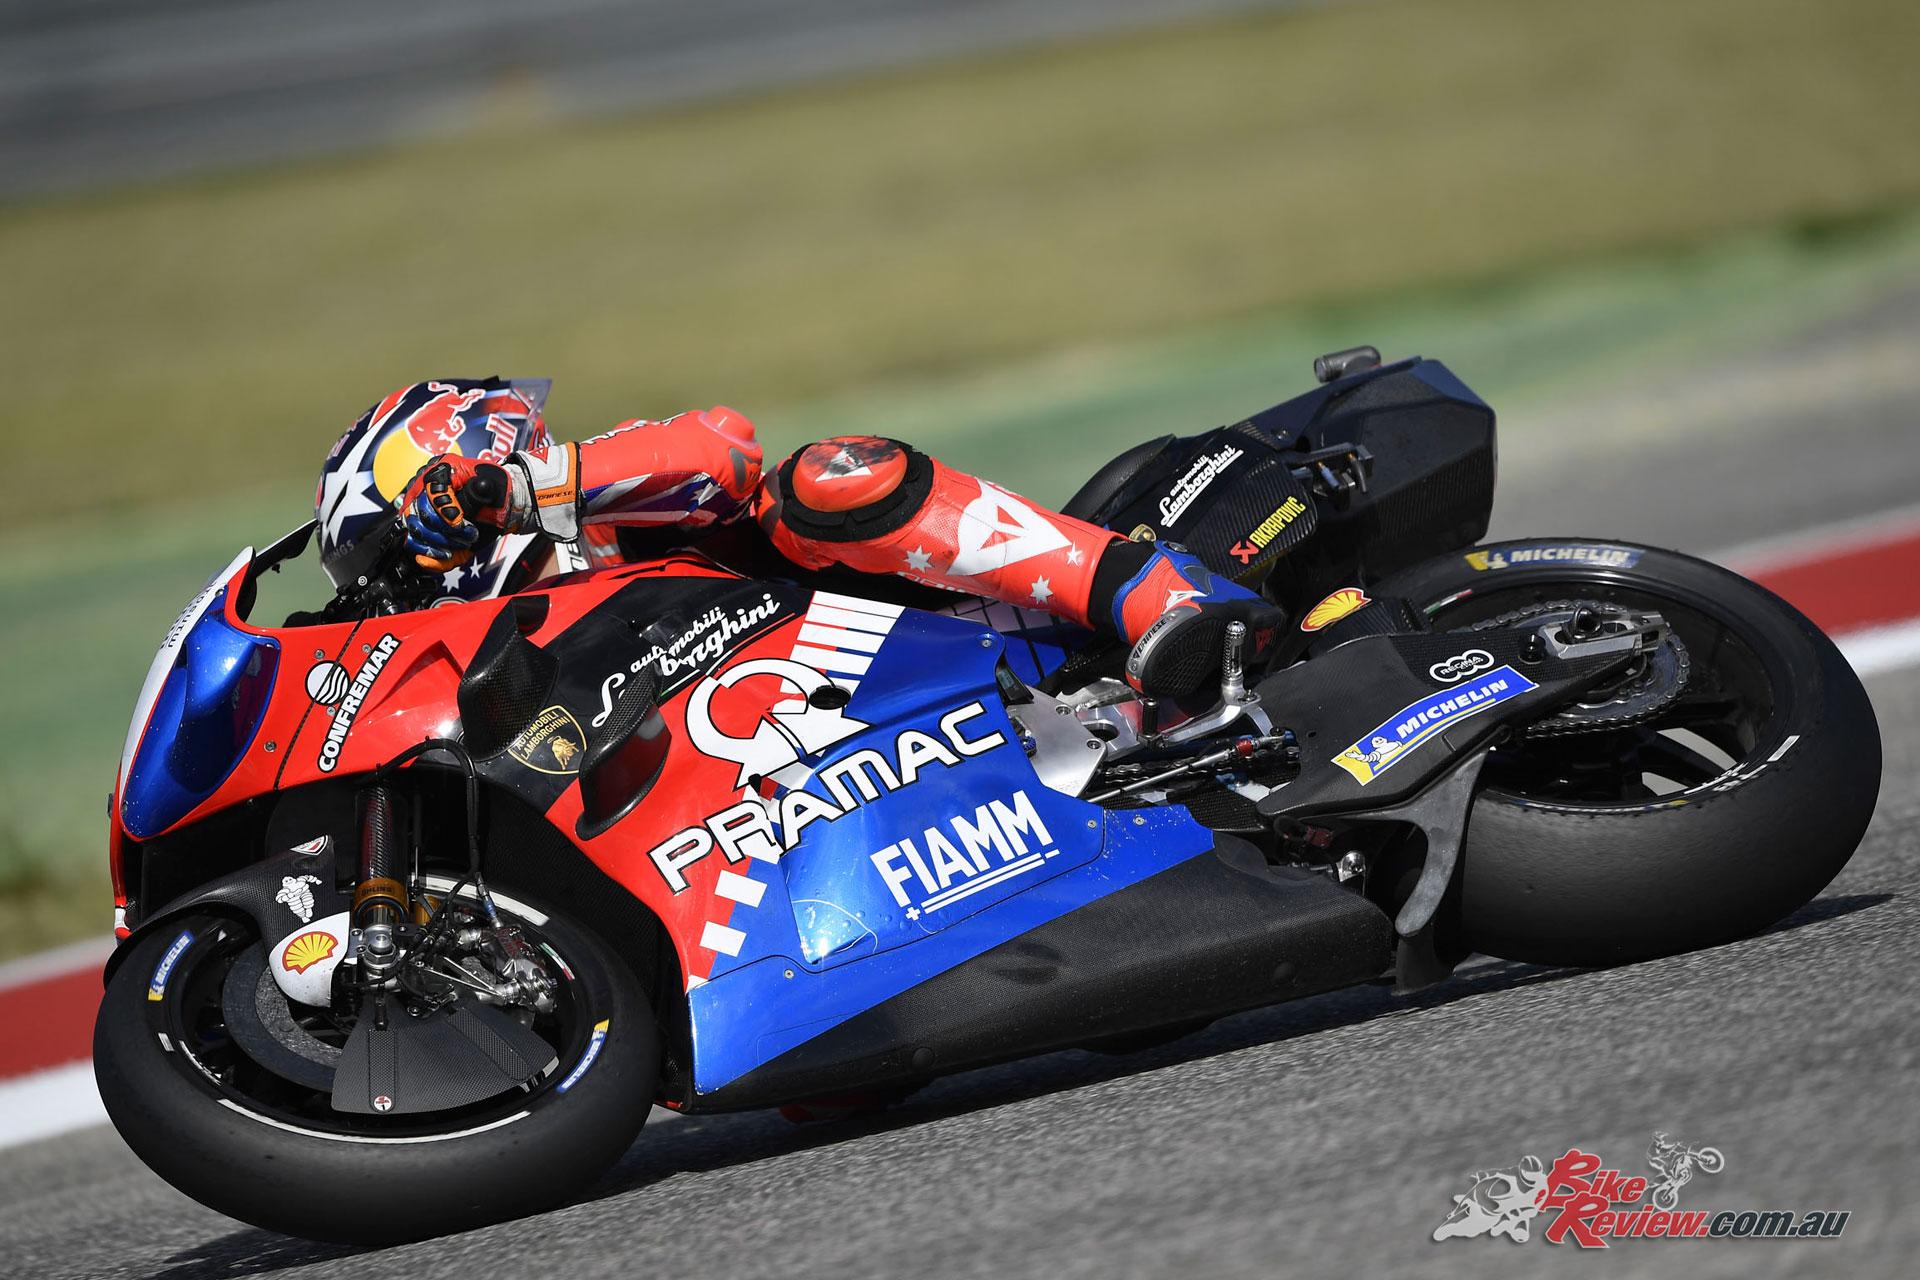 Jack Miller - 2019 Circuit of the Americas MotoGP